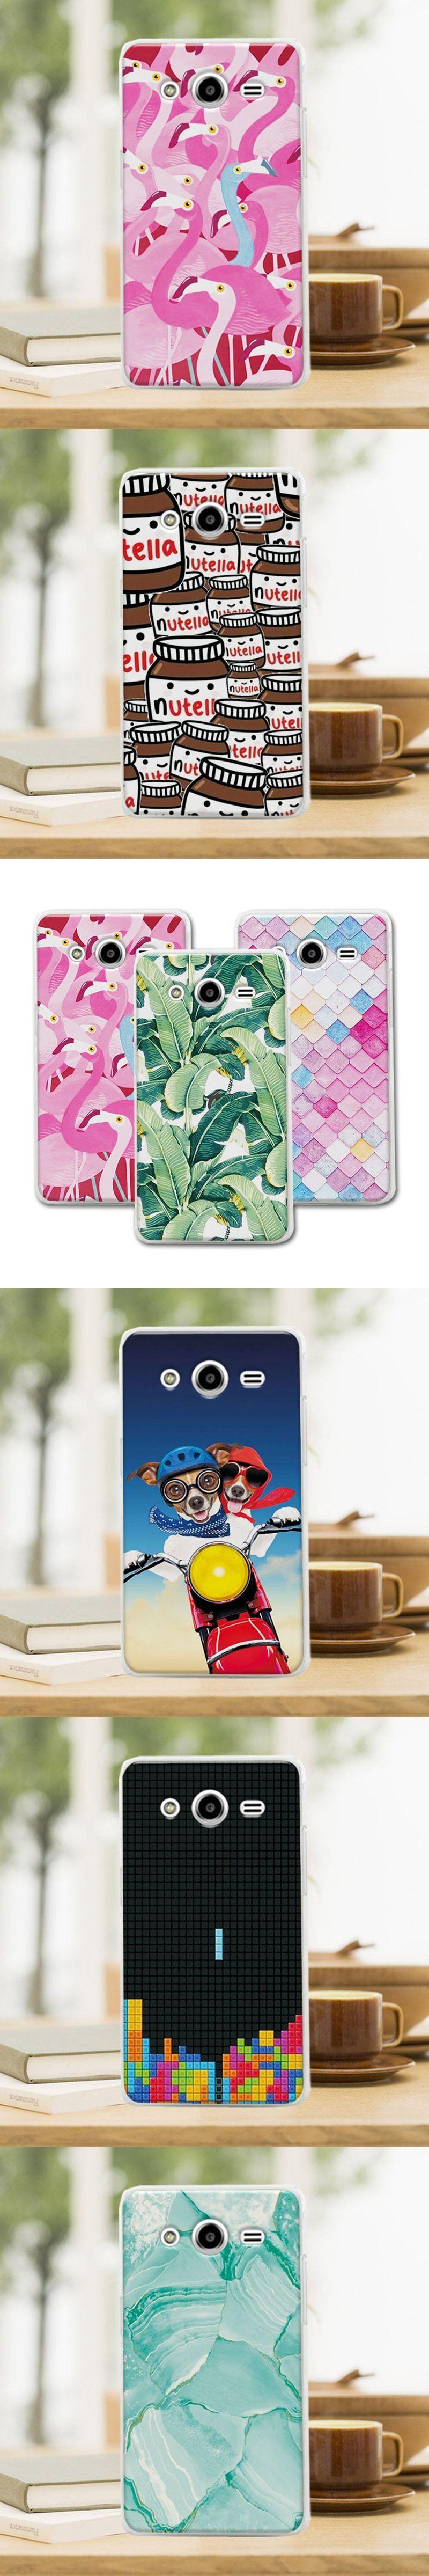 Mermaid Newest Flamingo Cute Phone Case For Samsung Galaxy Core 2 G355H SM G355H Case